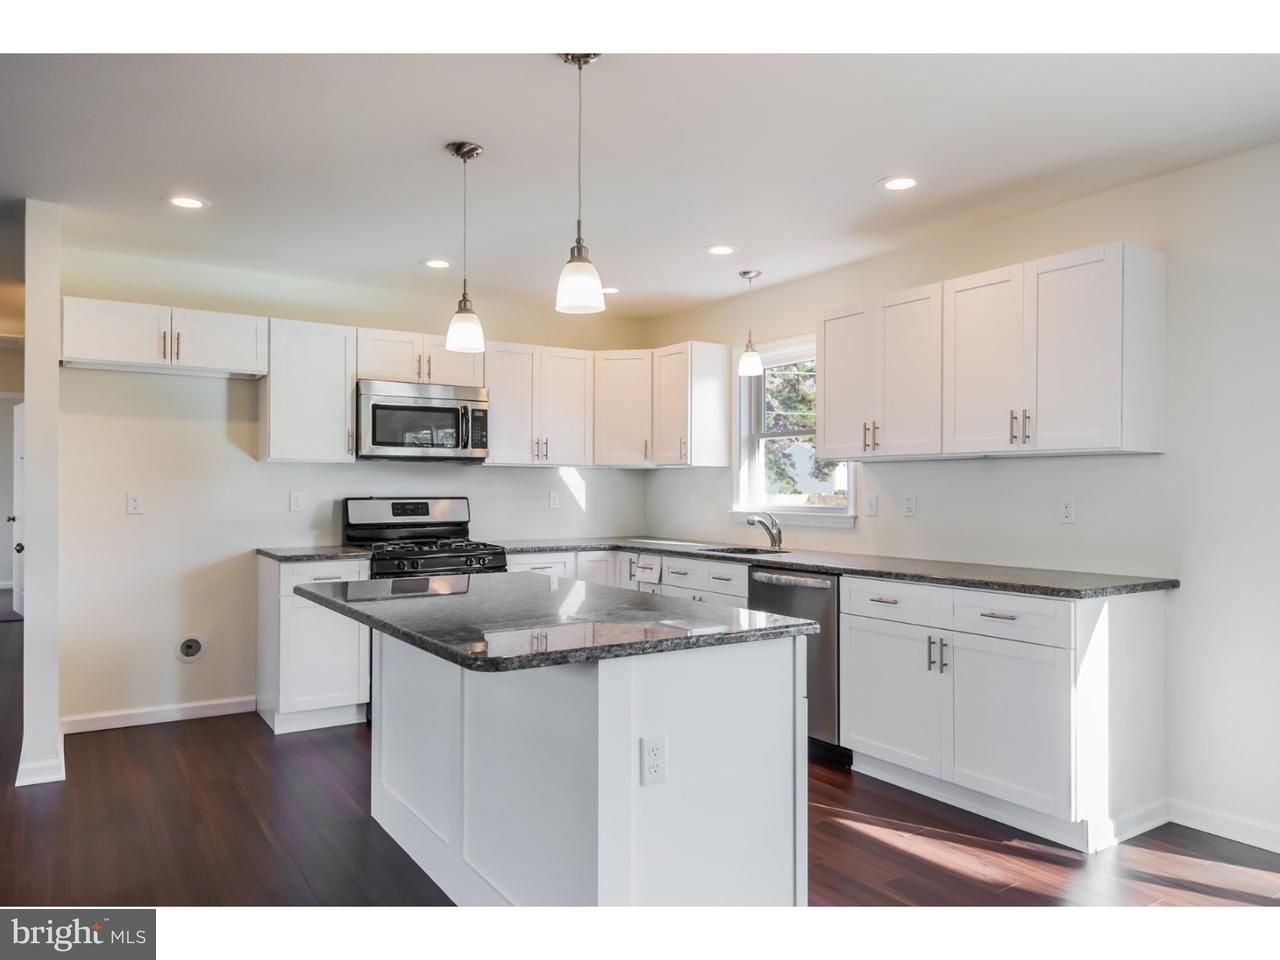 110 Hunter Blvd, Browns Mills, NJ 08015 - Recently Sold | Trulia